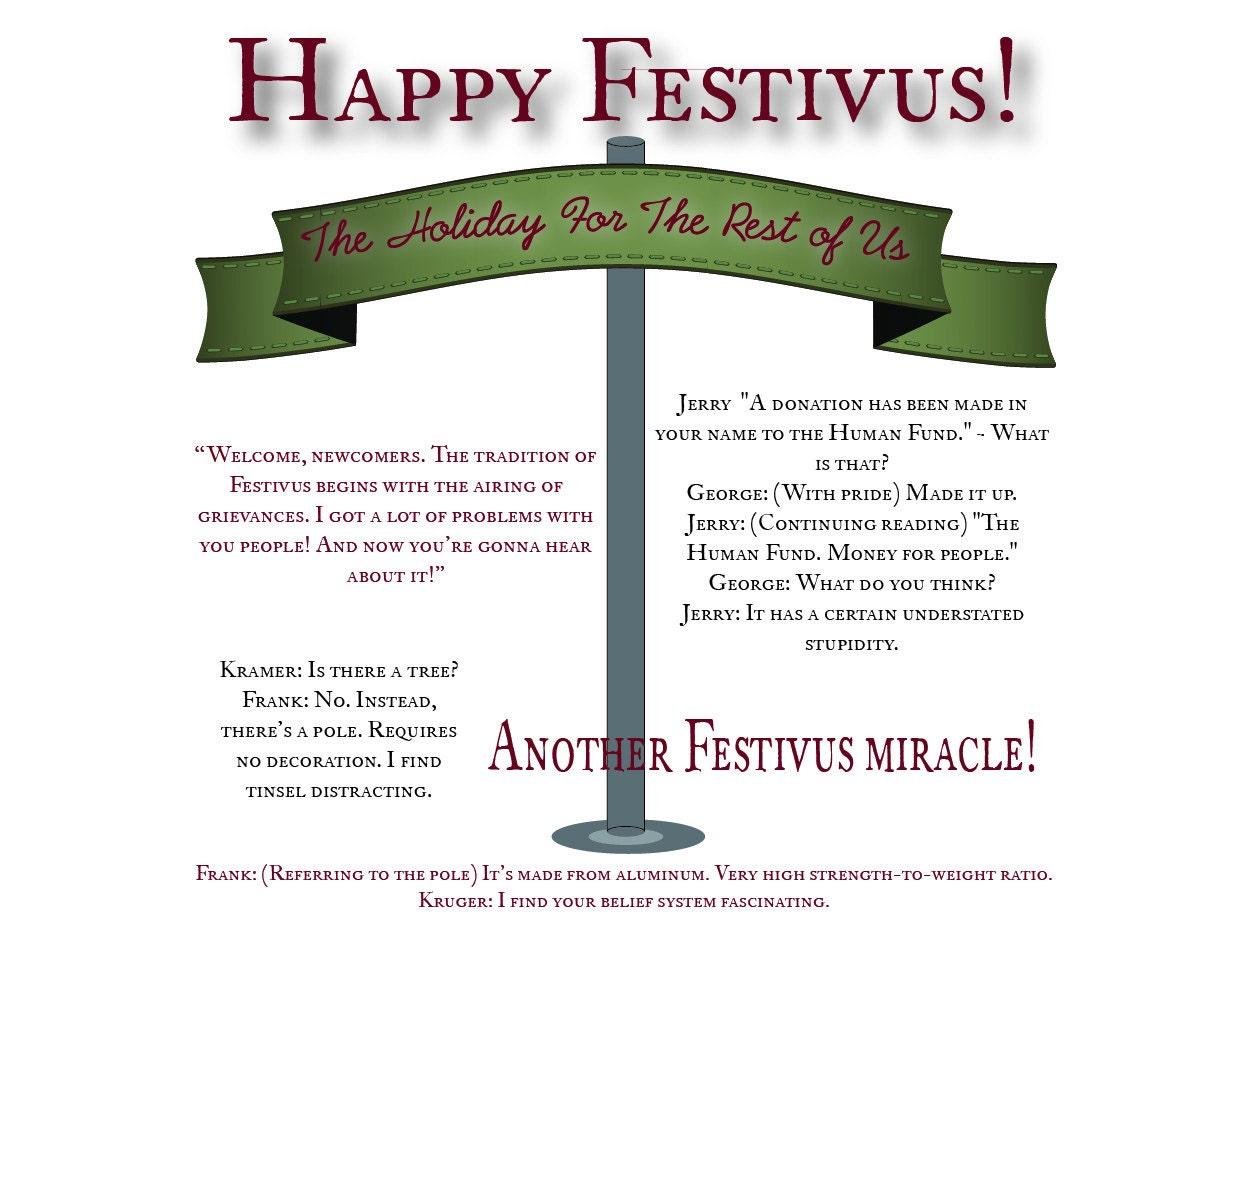 Happy festivus holiday card festivus card humor sarcasm happy festivus holiday card festivus card humor sarcasm seinfeld holidays holiday for the rest of us alternative holiday m4hsunfo